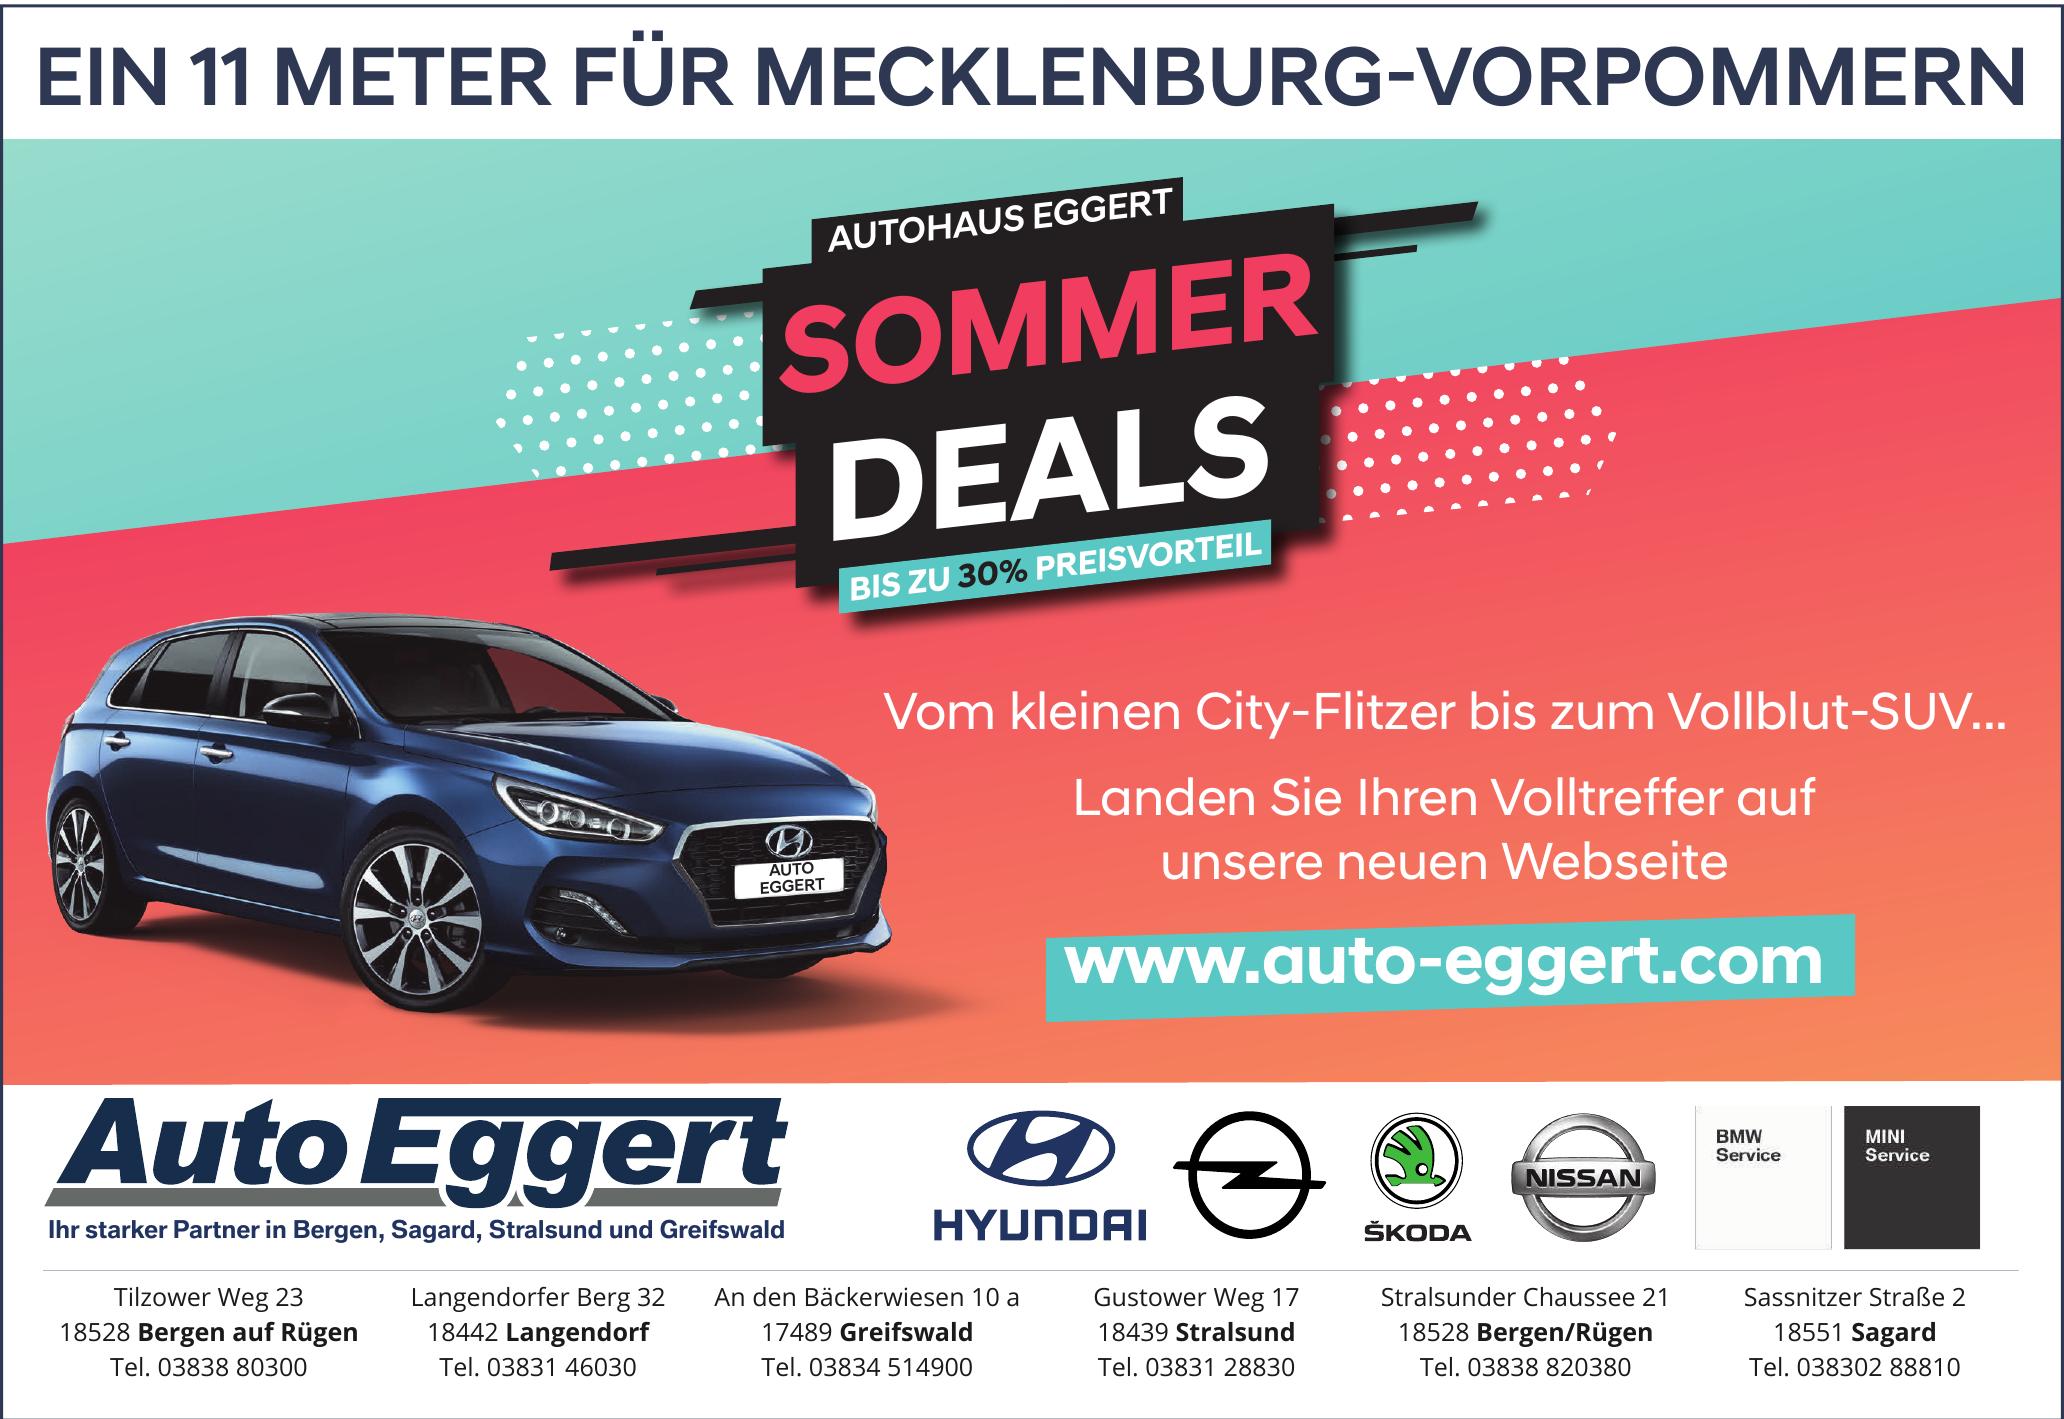 Auto Eggert GmbH